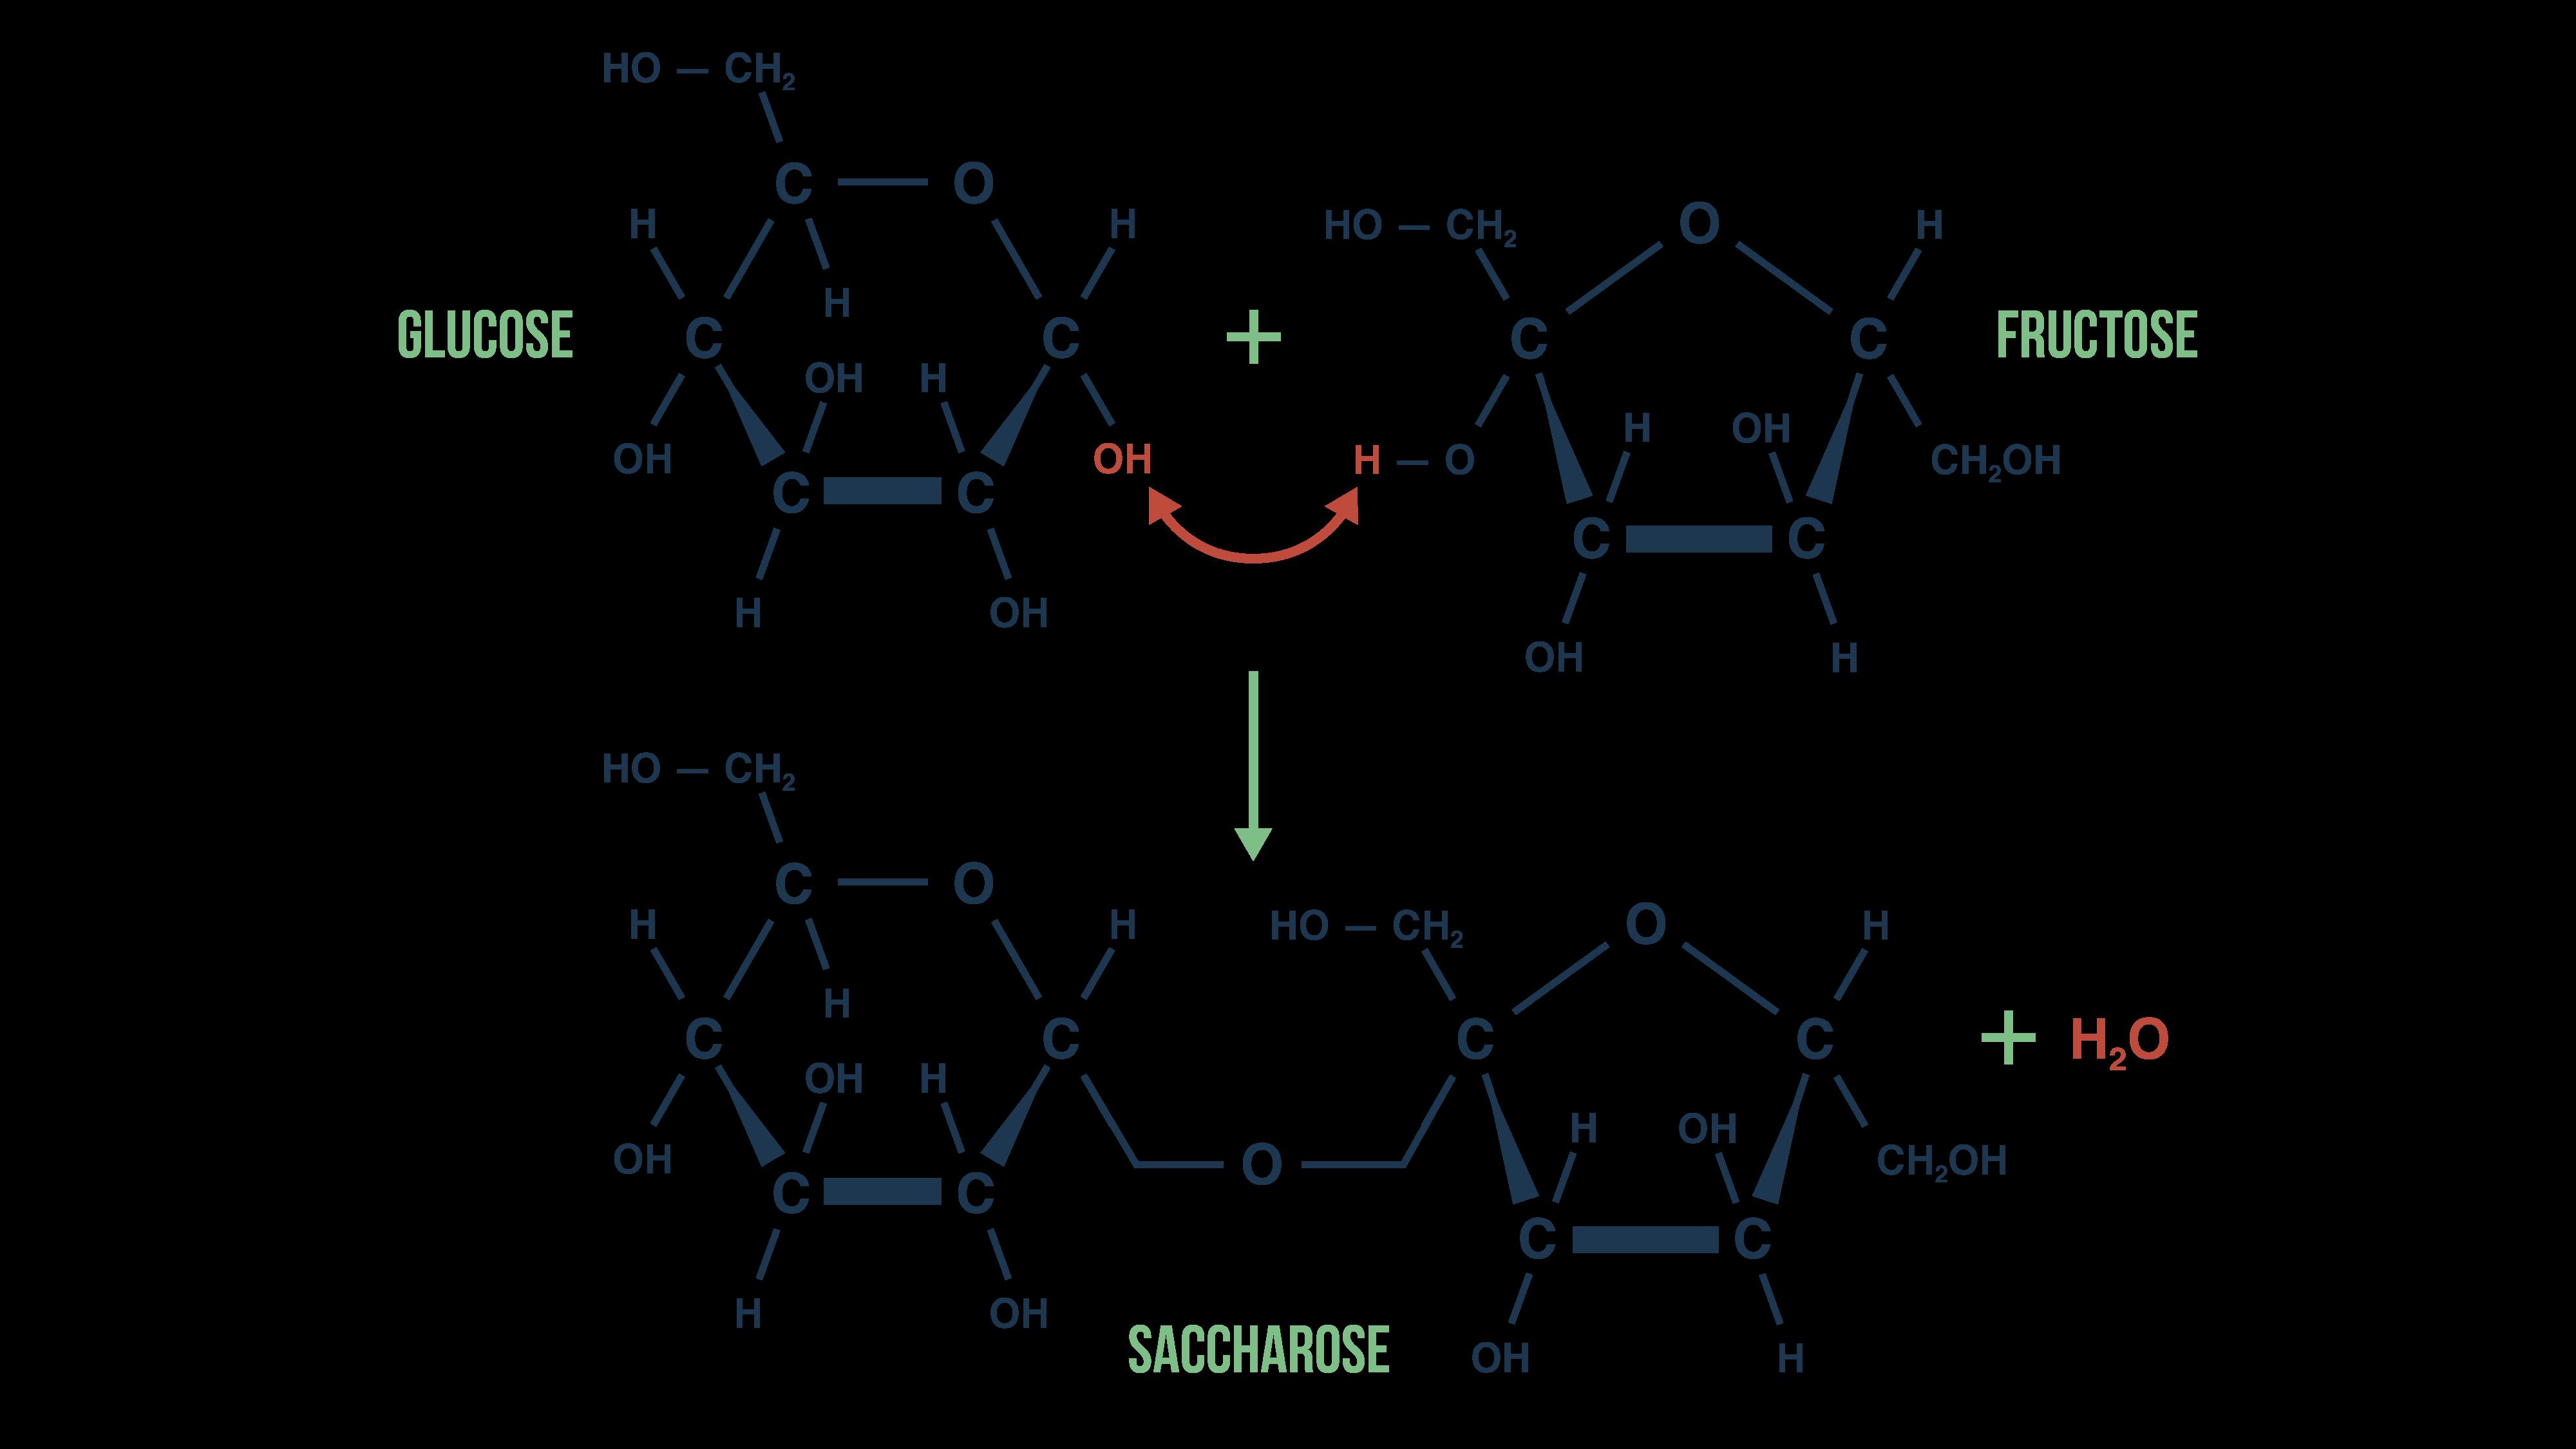 Assemblage des molécules du saccharose